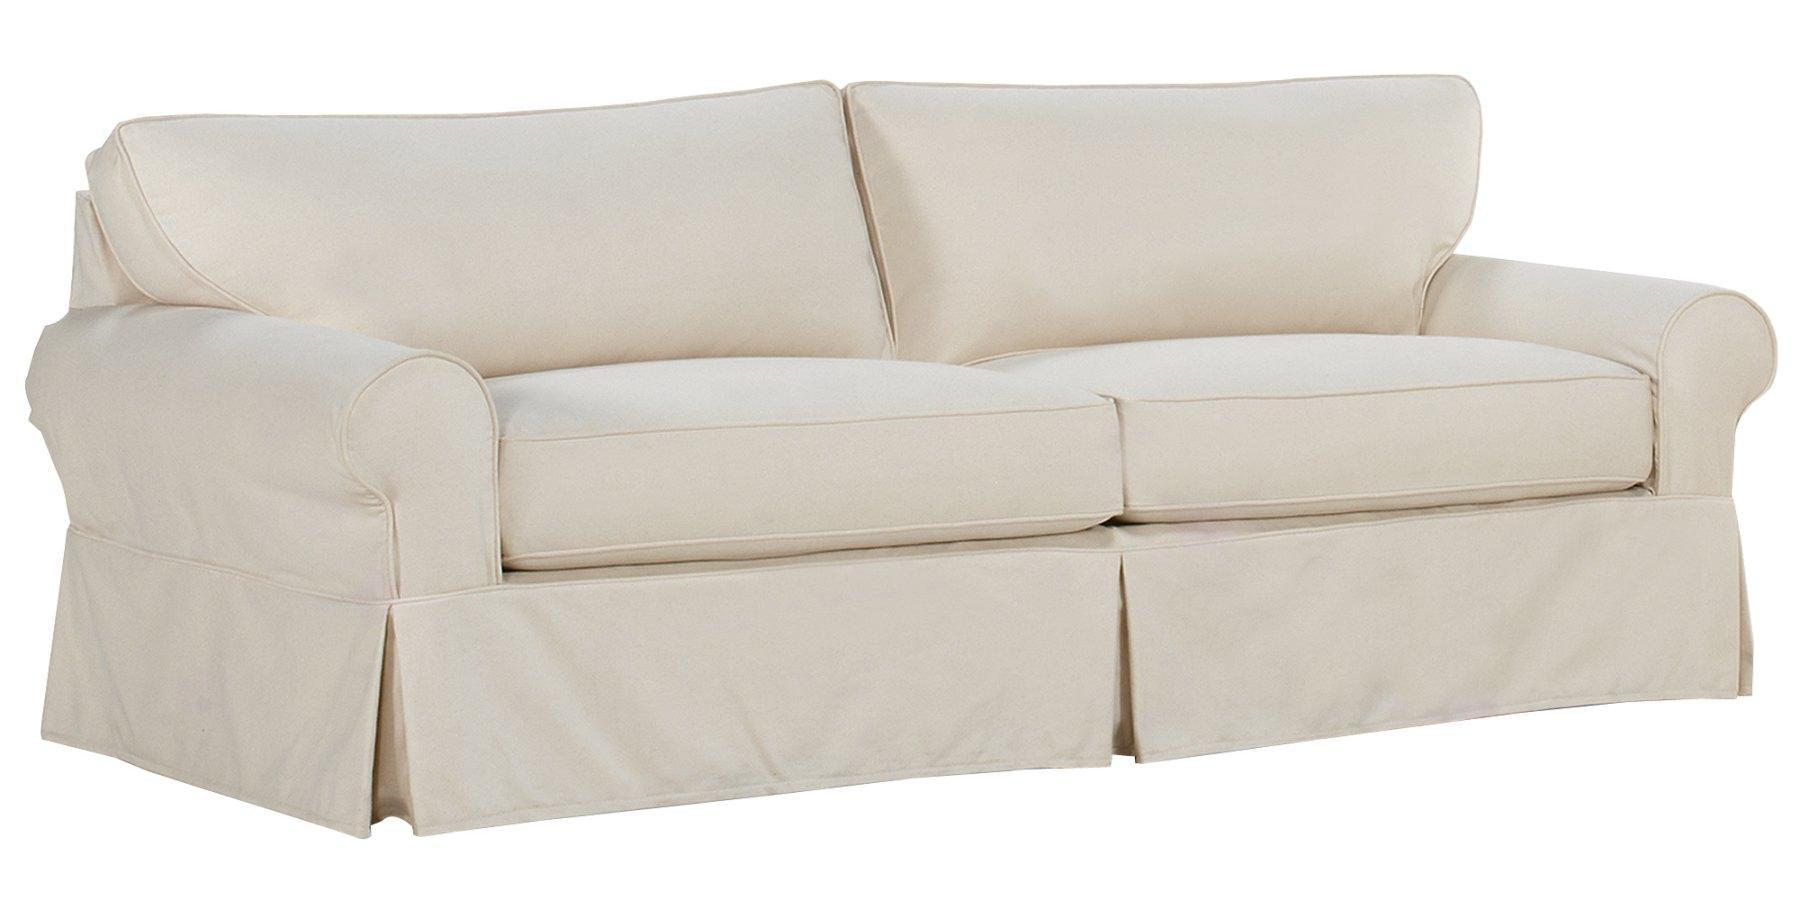 rowe slipcover sofa red home decor 20+ choices of sleeper slipcovers | ideas